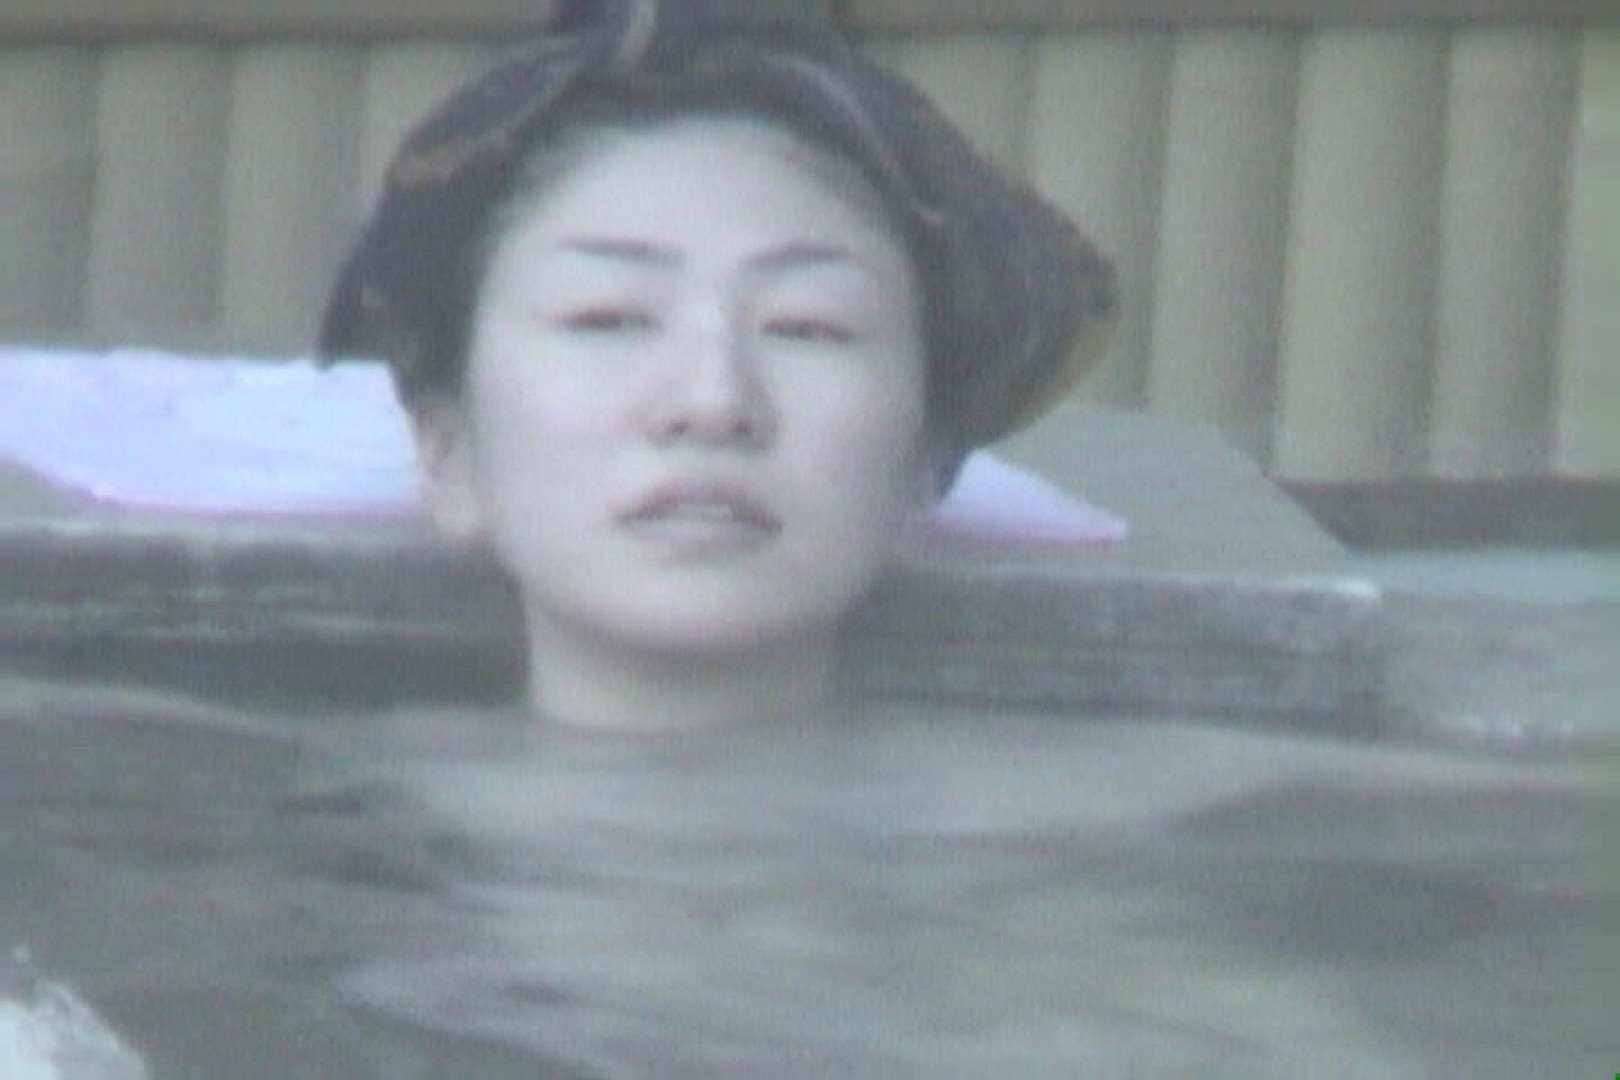 Aquaな露天風呂Vol.607 綺麗なOLたち アダルト動画キャプチャ 90枚 77